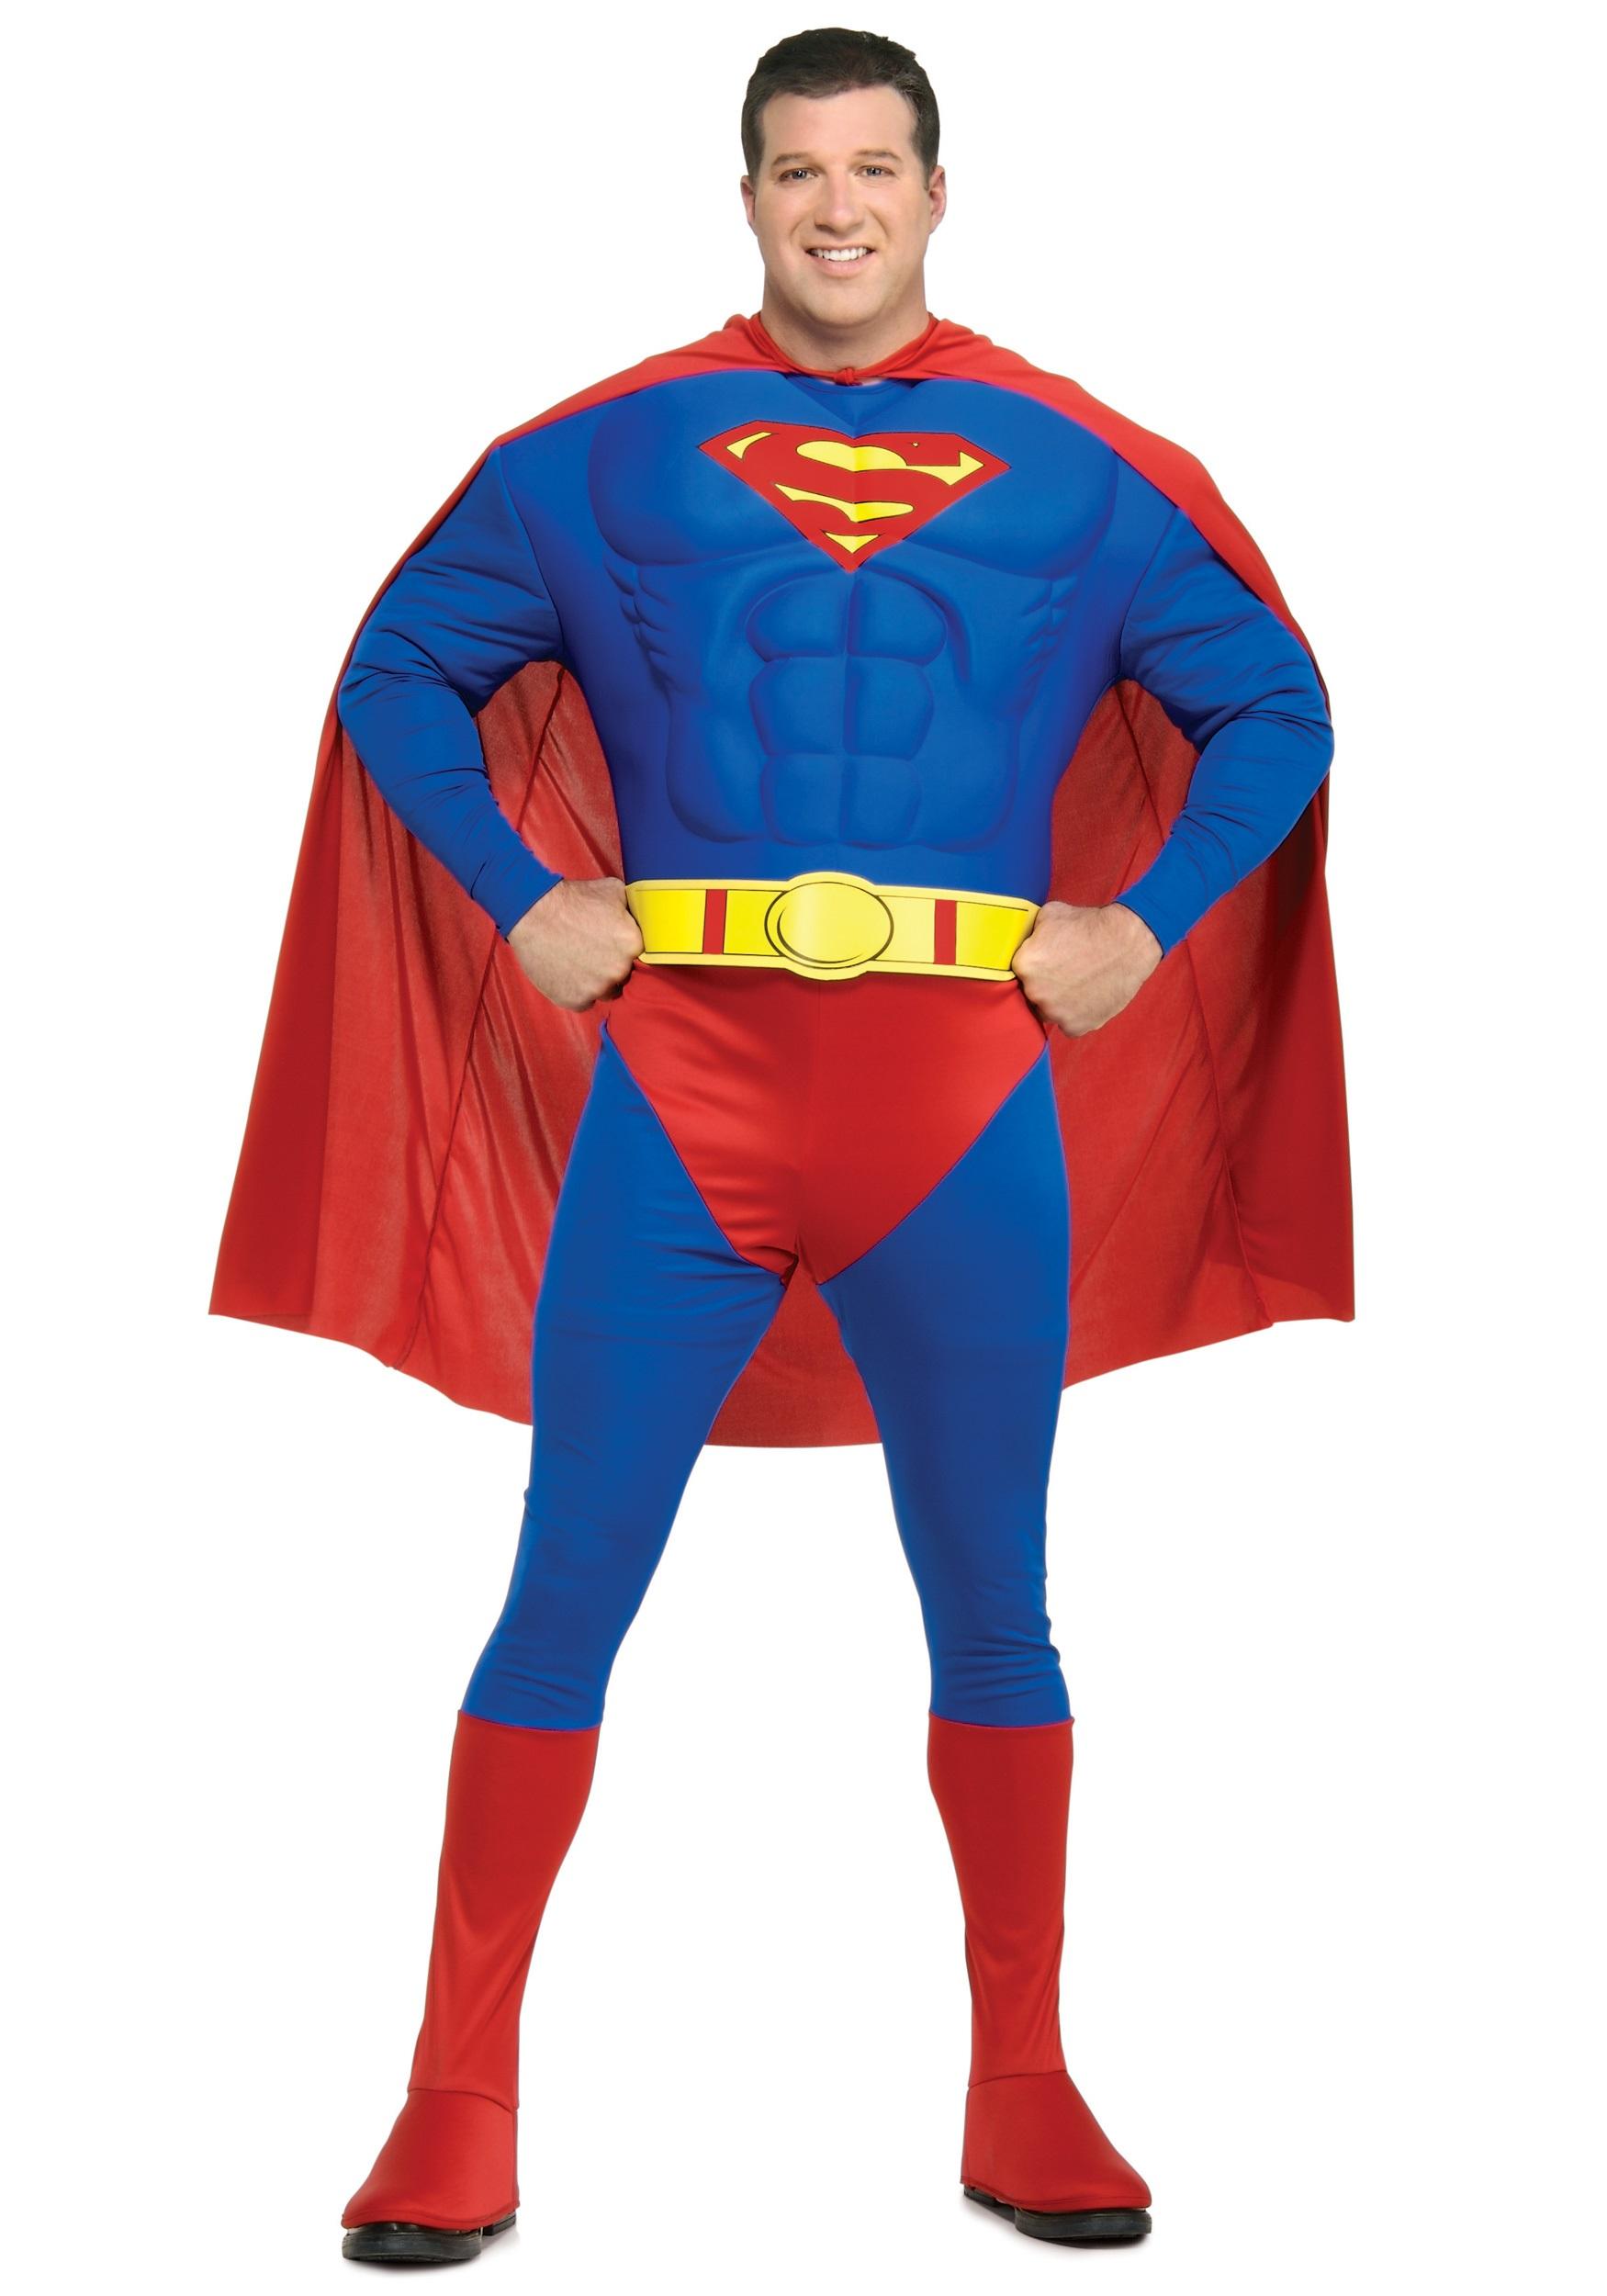 Superman Plus Size Superhero Costume  sc 1 st  Fun.com & Plus Size Superman Superhero Costume